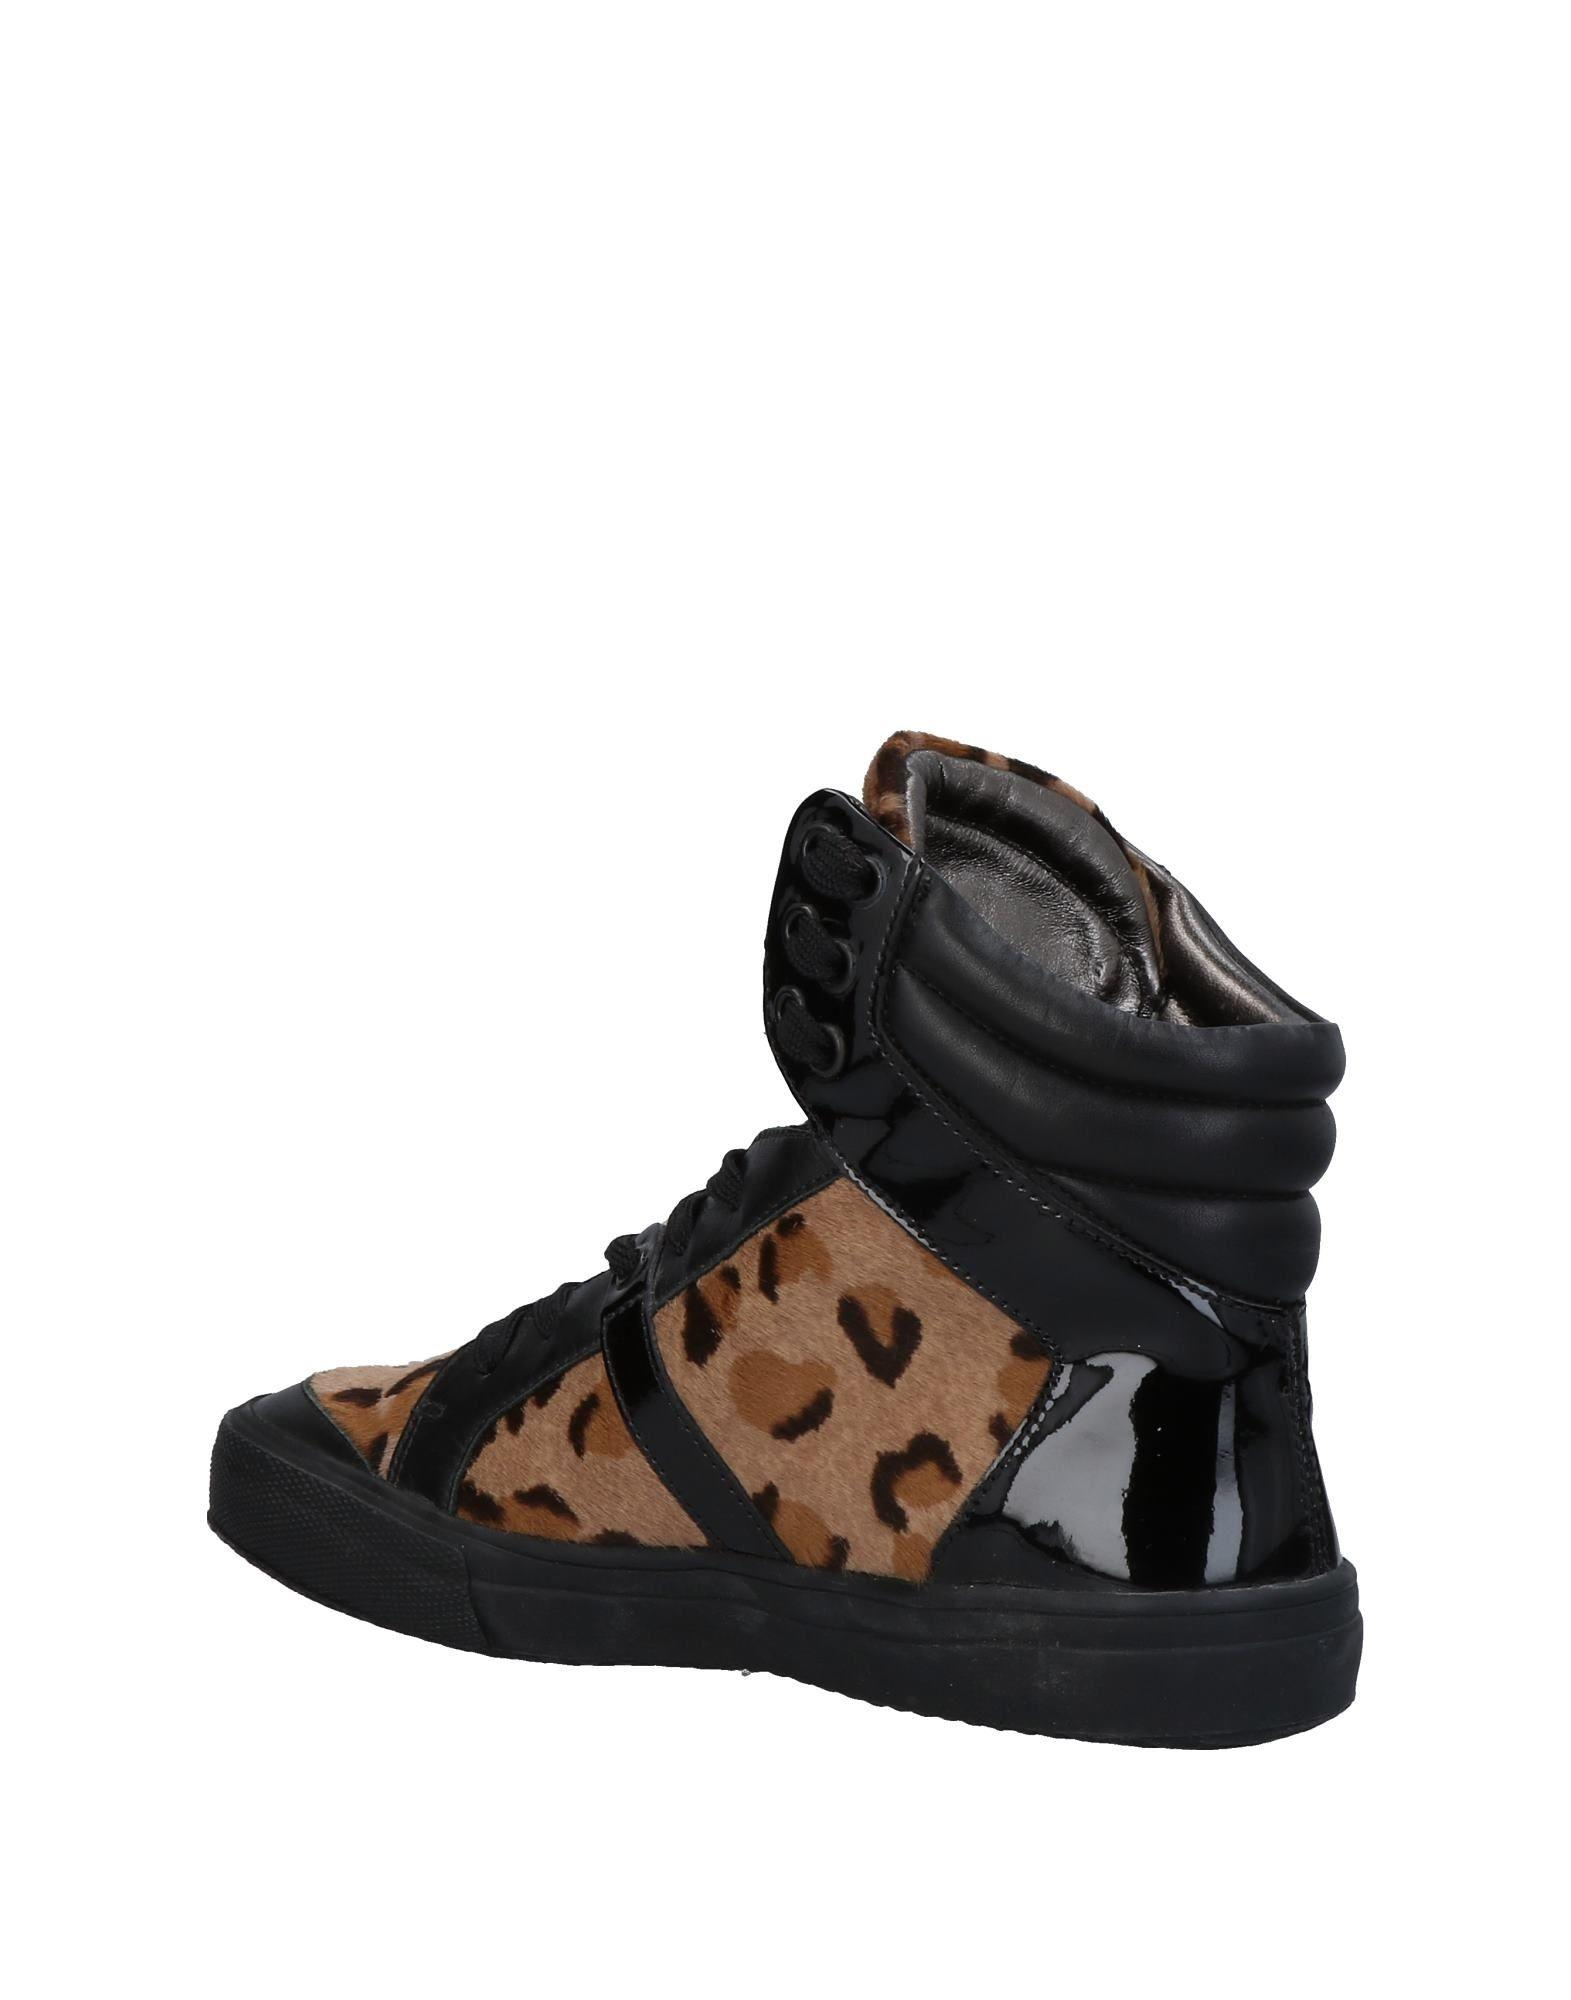 Sonia Rykiel High-tops Et Chaussures De Sport zclAuz